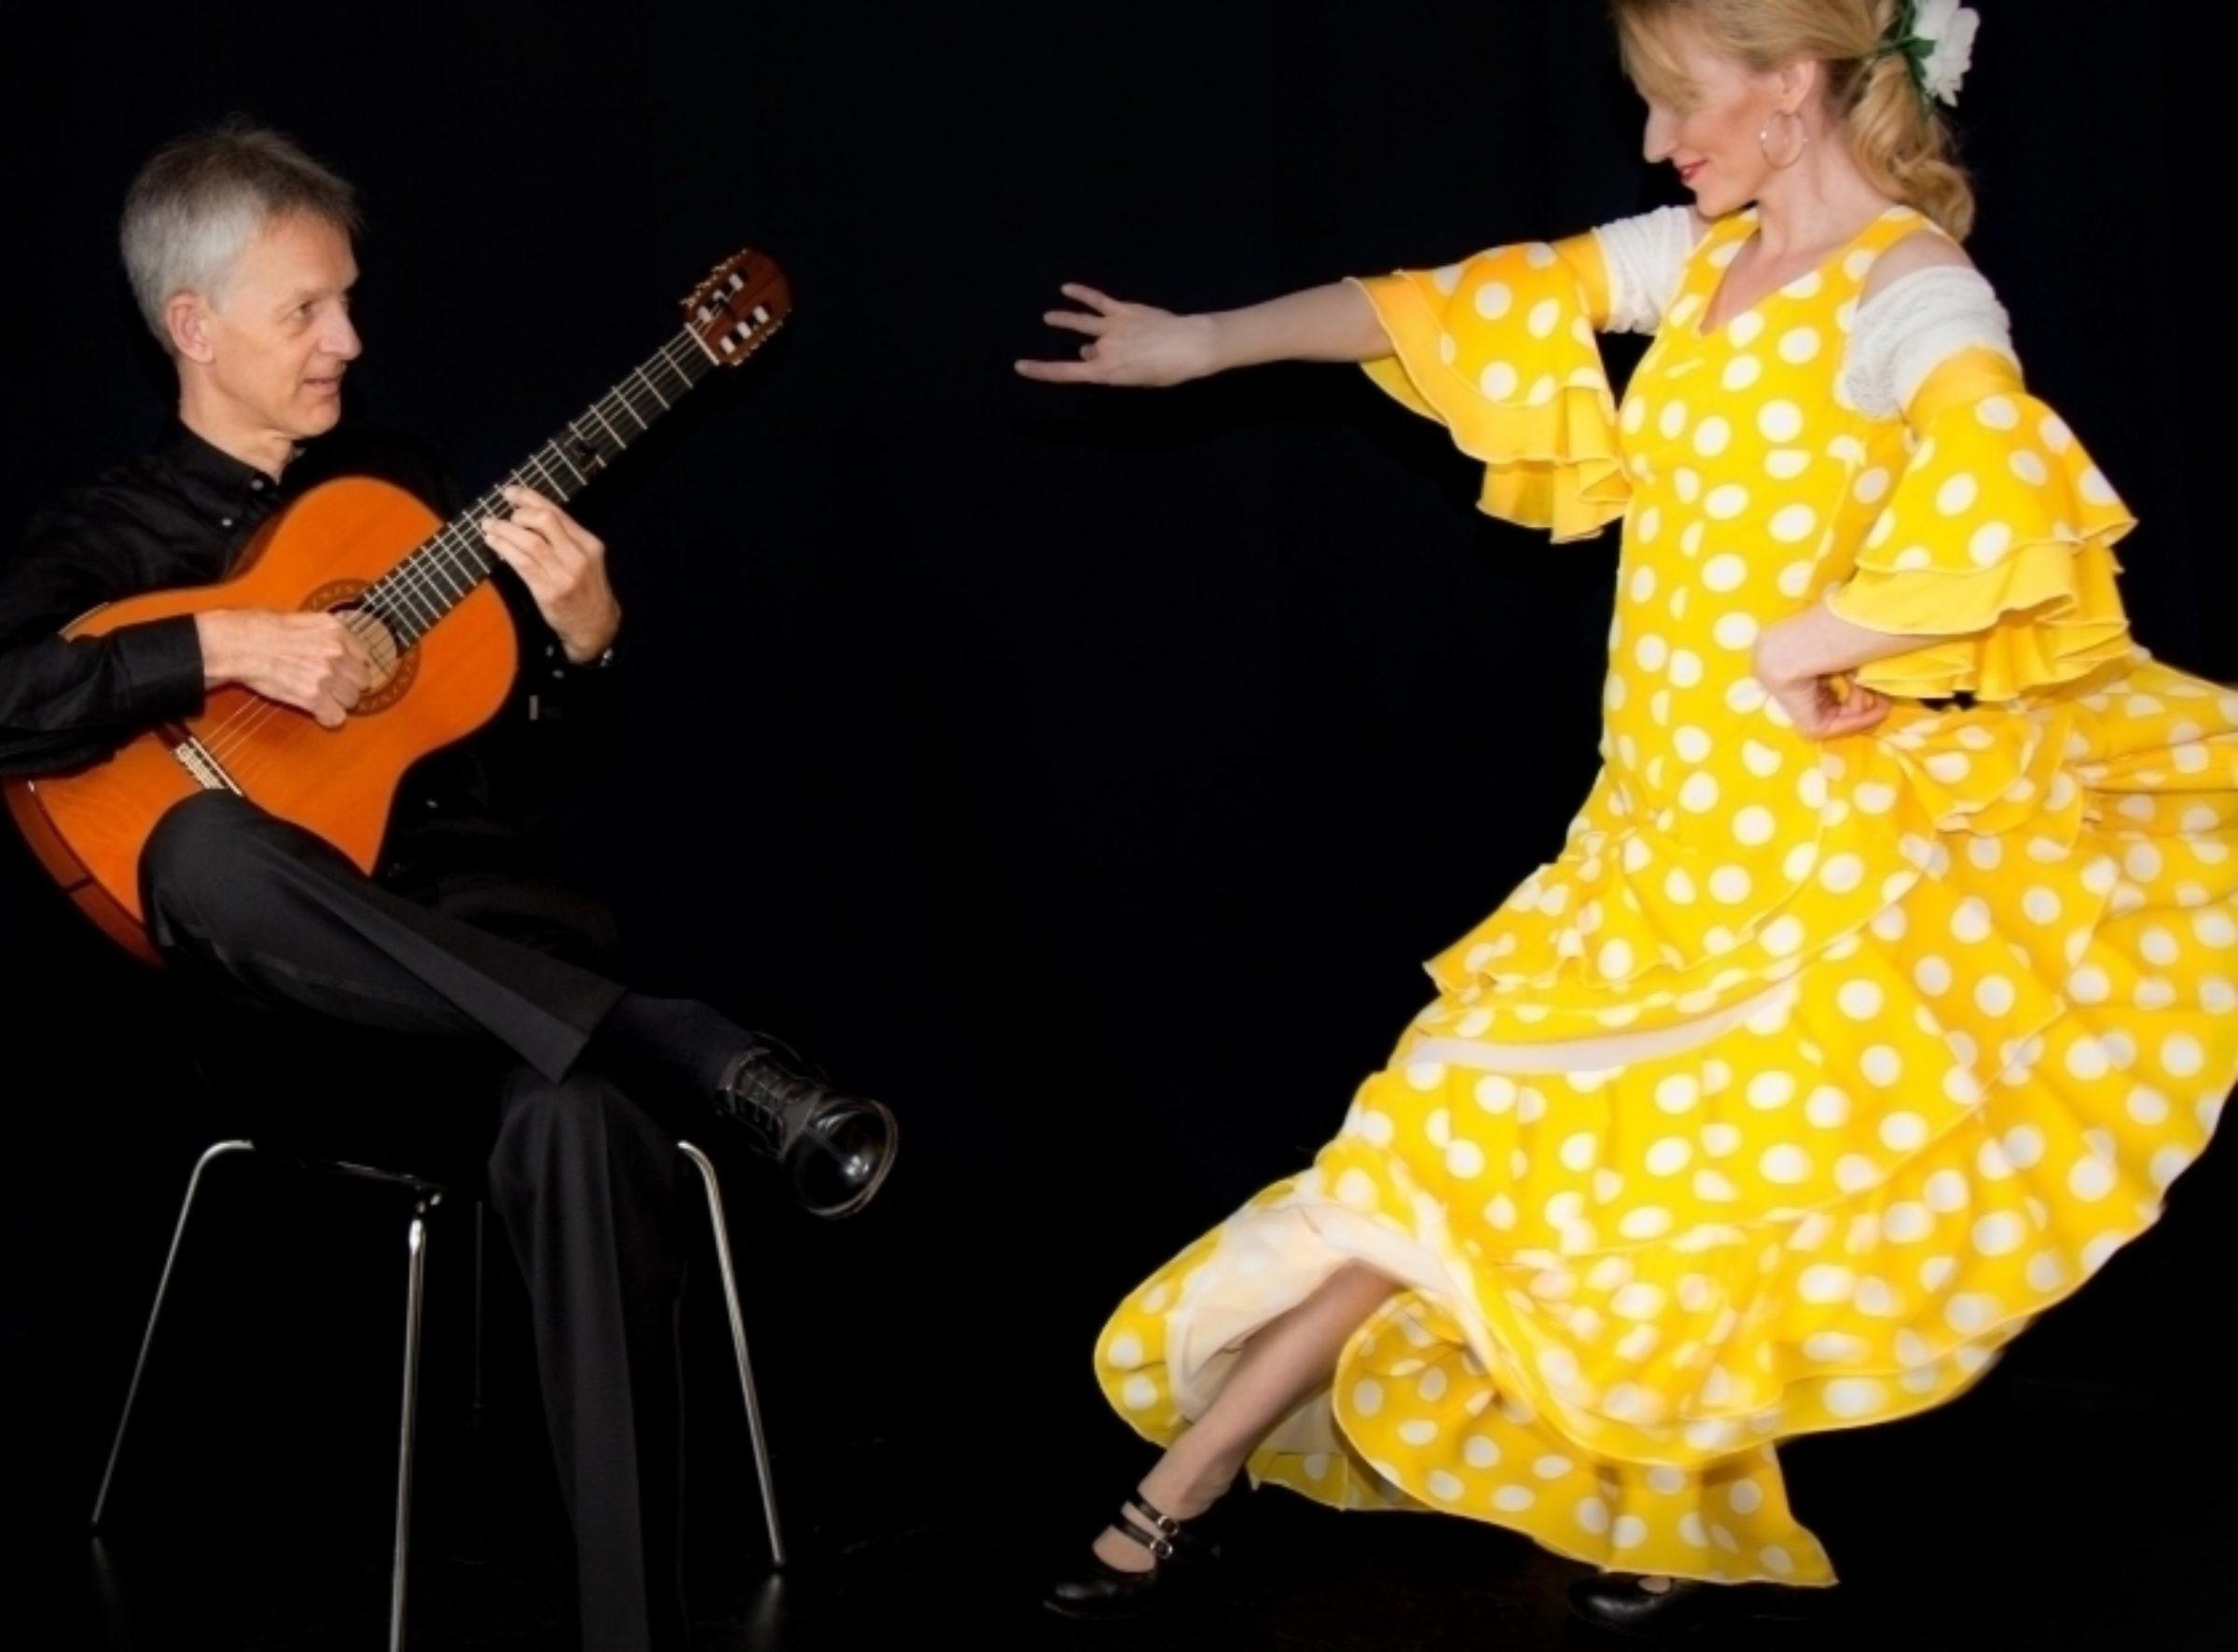 Flamenco dansvoorstelling enschede 3248 1561367345 35hxjiio8w